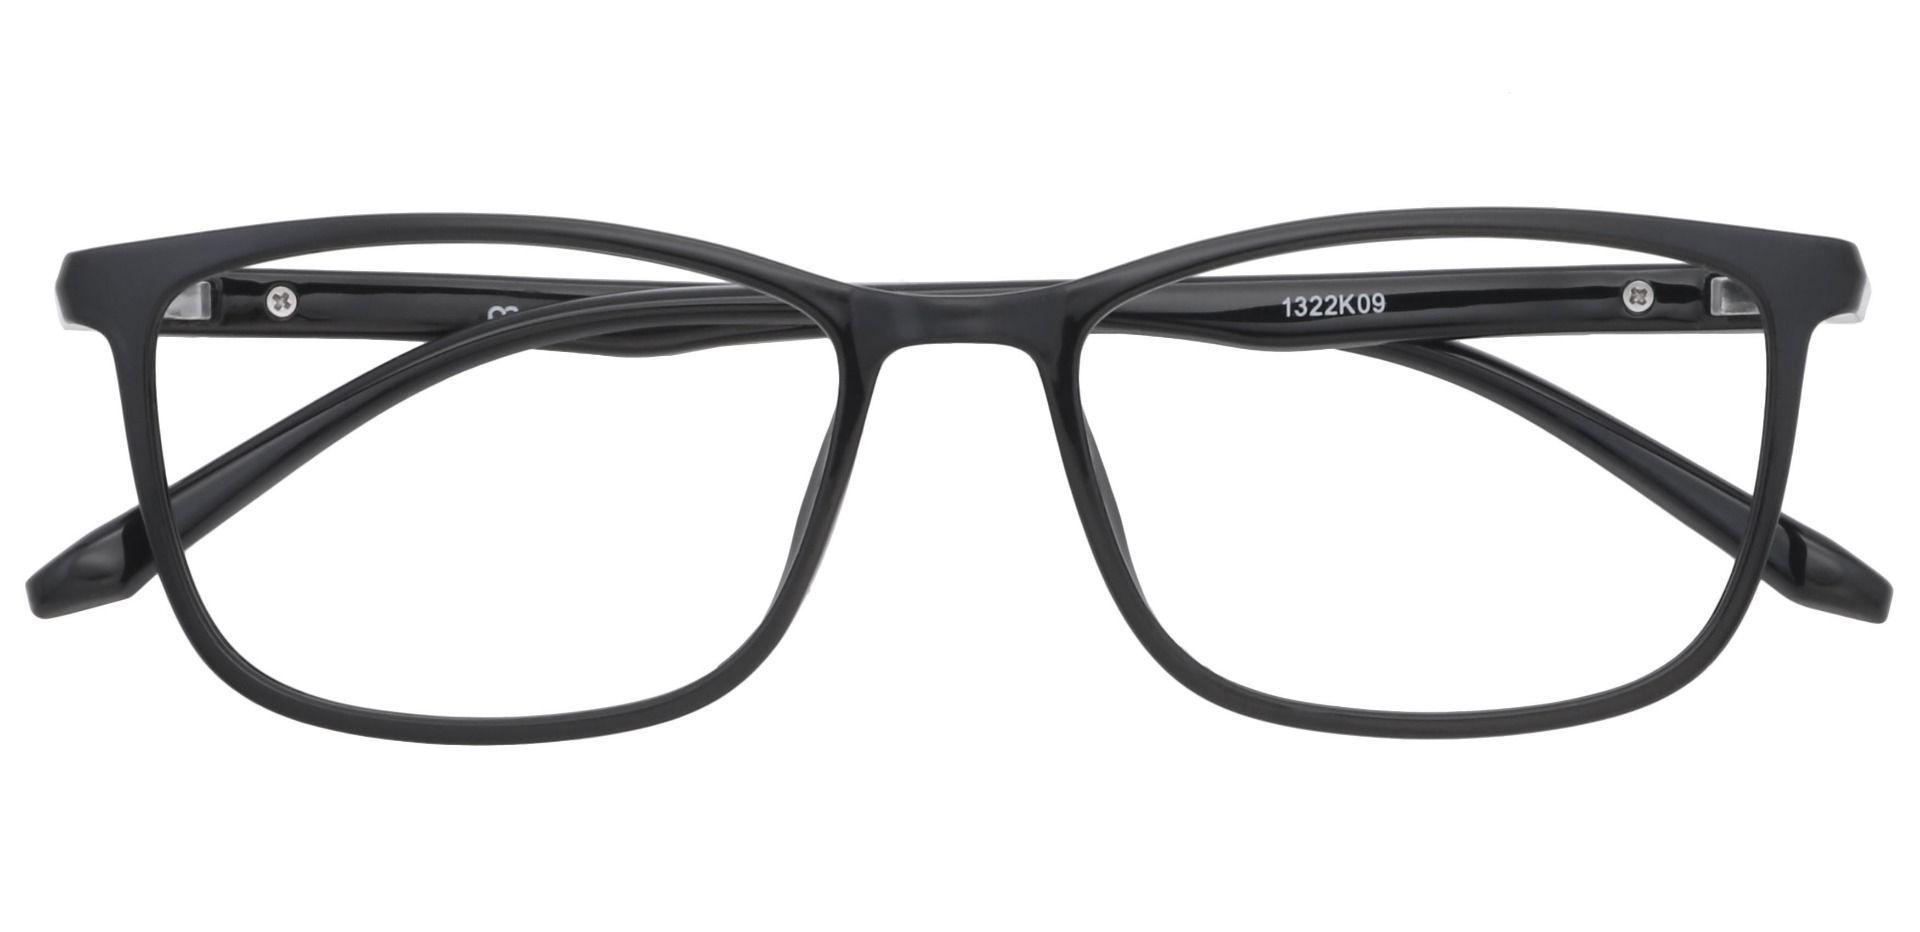 Harvest Rectangle Progressive Glasses - Black